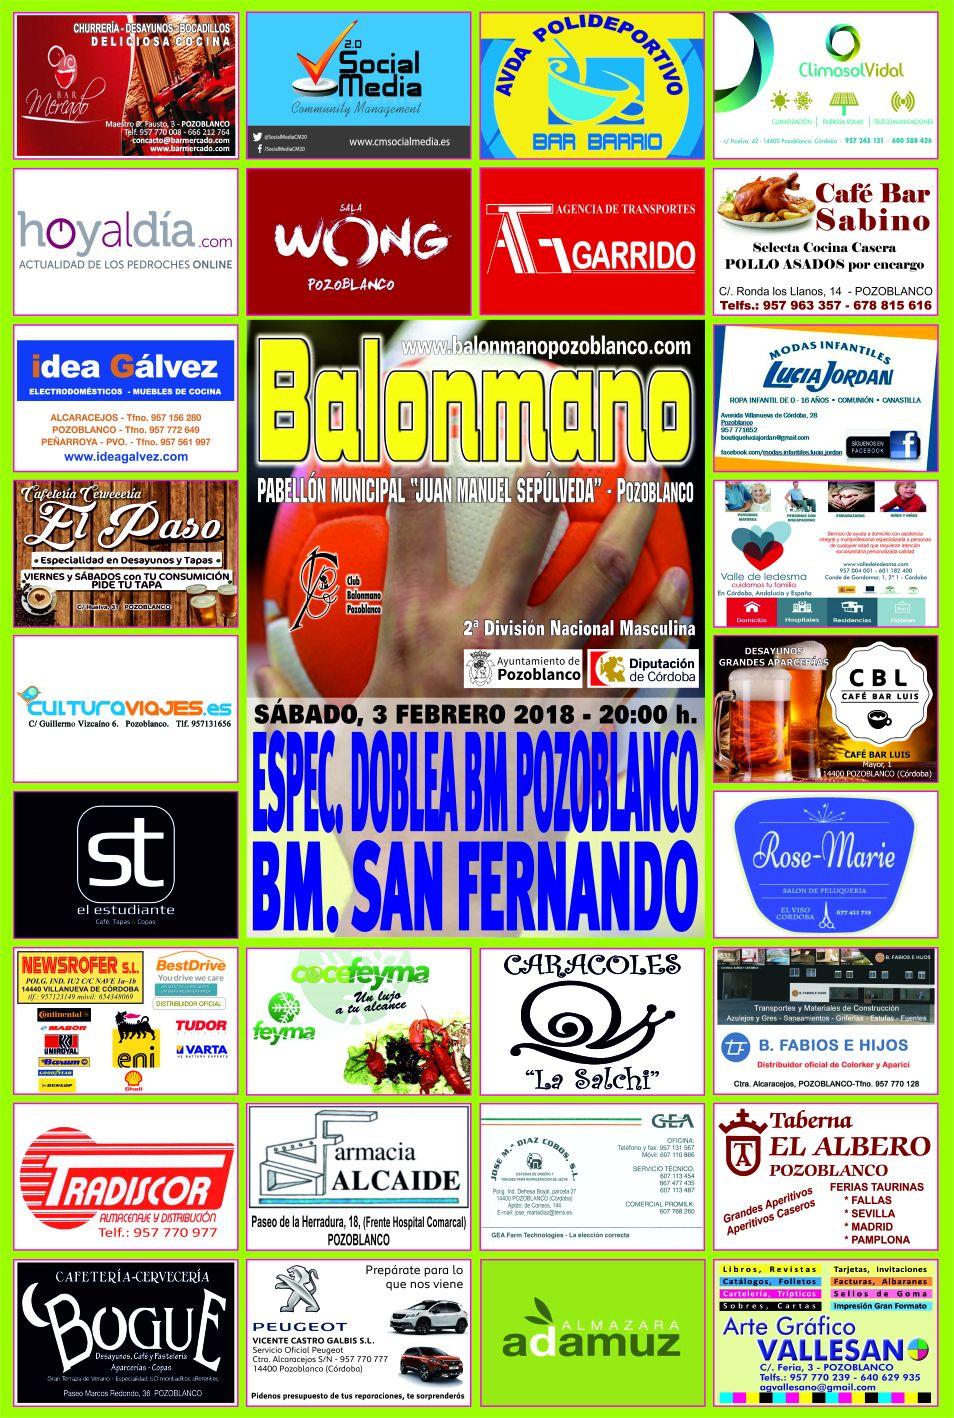 Balonmano Pozoblanco - BM San Fernando